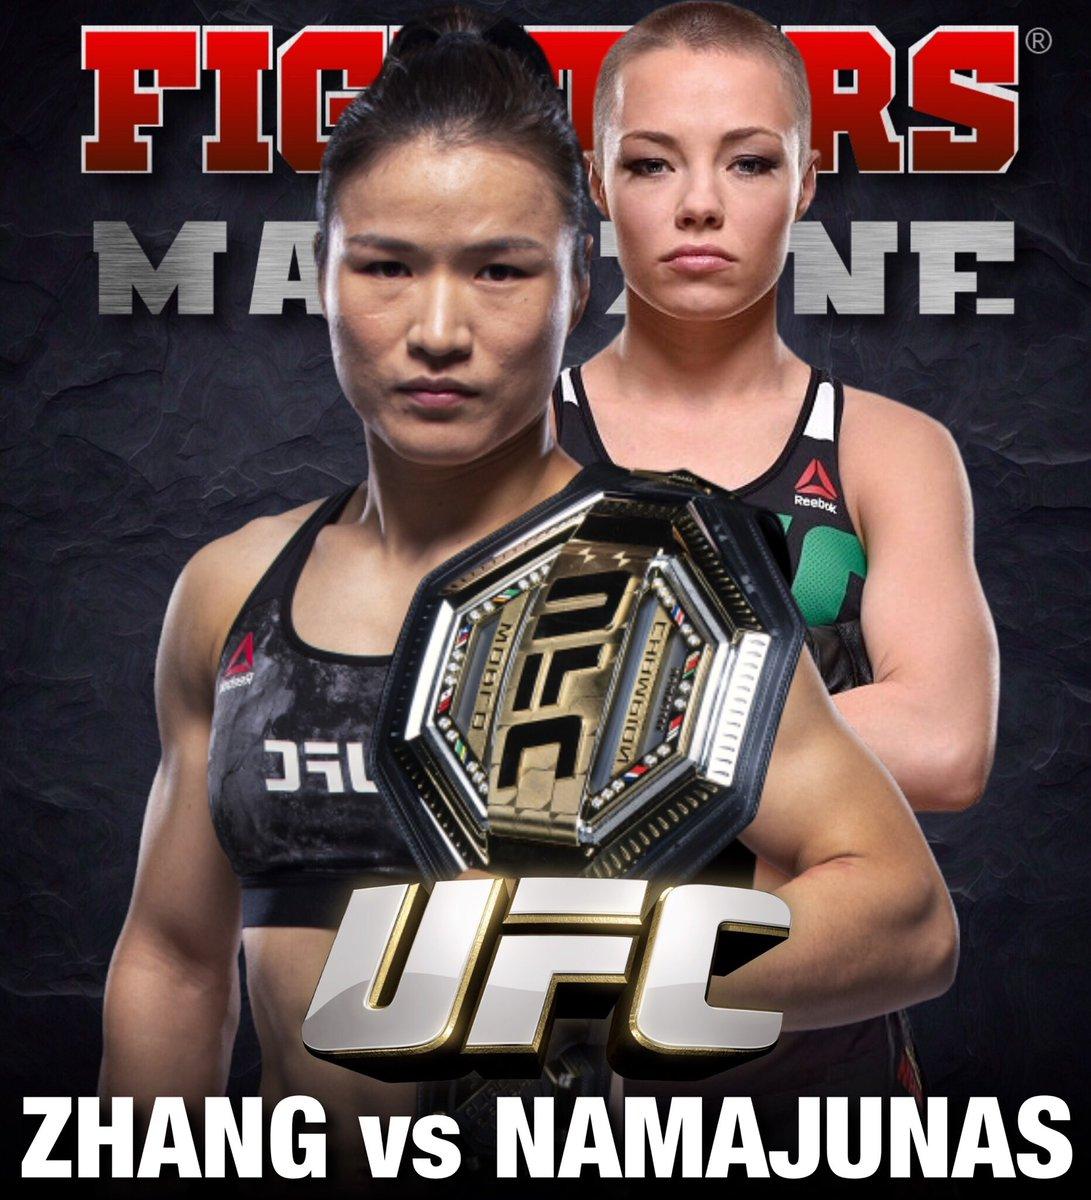 🏆🔥 ¡Tenemos una guerra! Weili Zhang vs Rose Namajunas, se enfrentarán en UFC 261, el próximo 24 de abril. #UFC #UFC261 #MMA shampoo